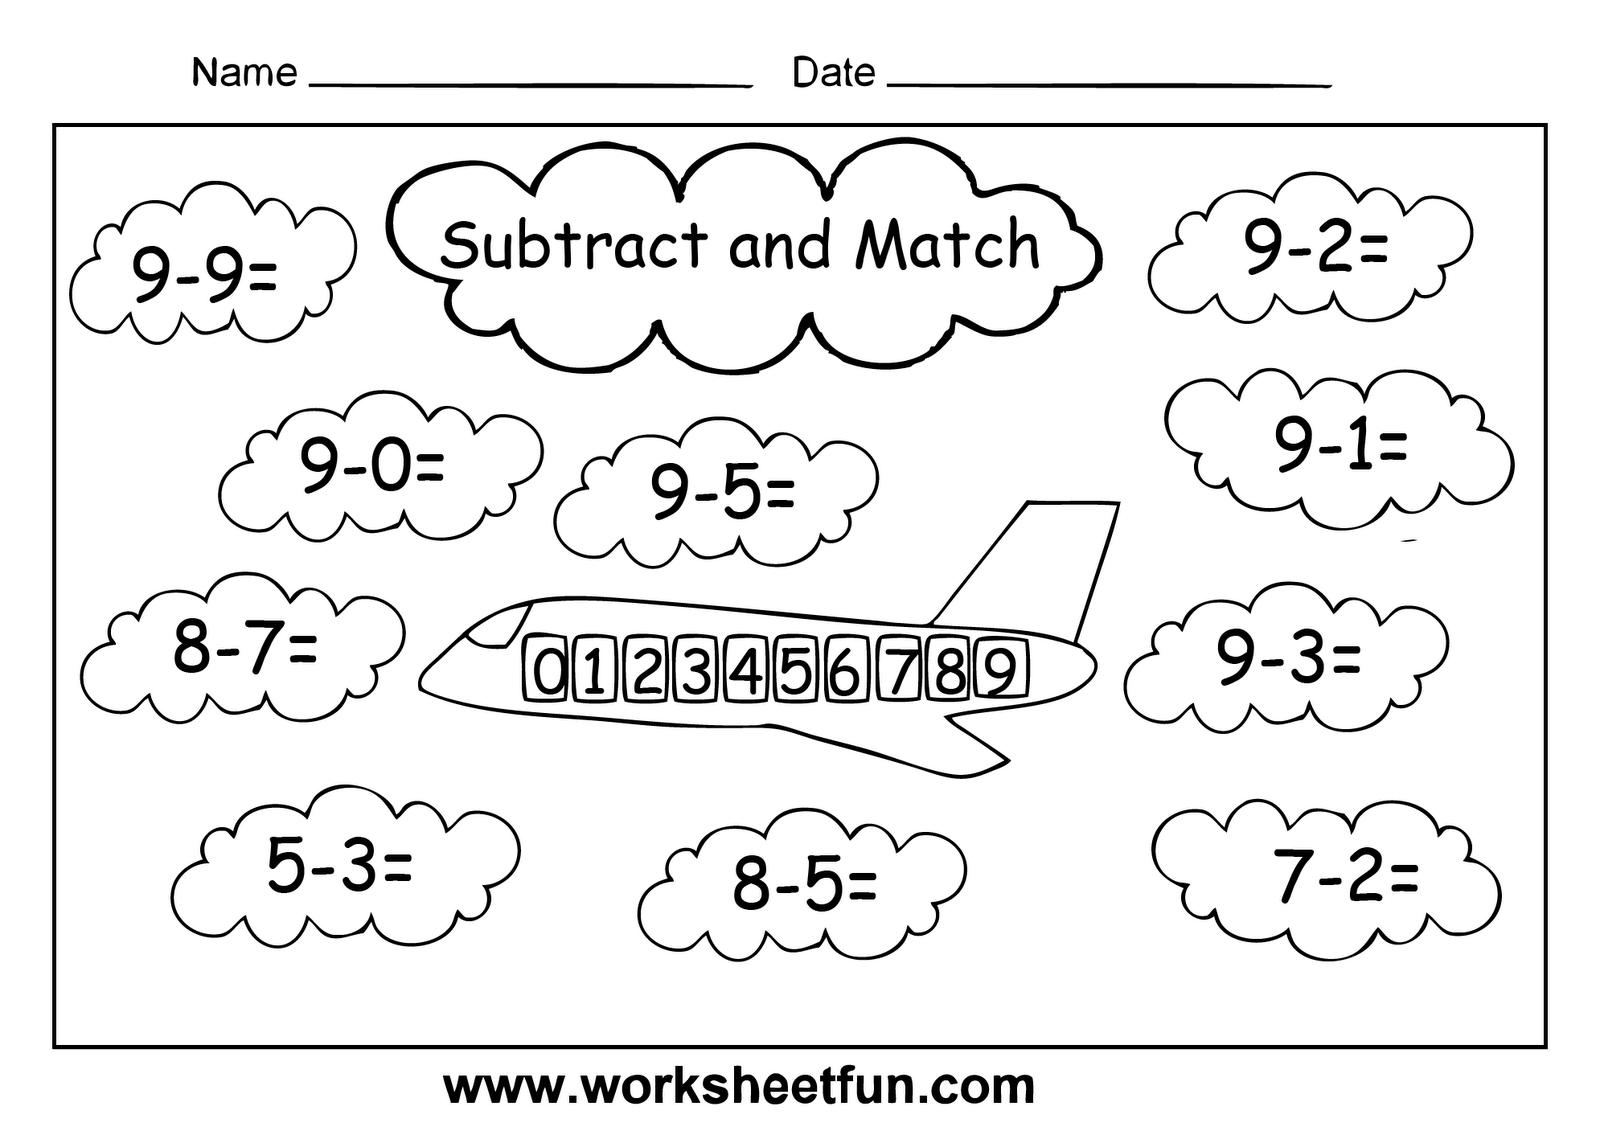 medium resolution of Worksheetfun - FREE PRINTABLE WORKSHEETS   1st grade math worksheets